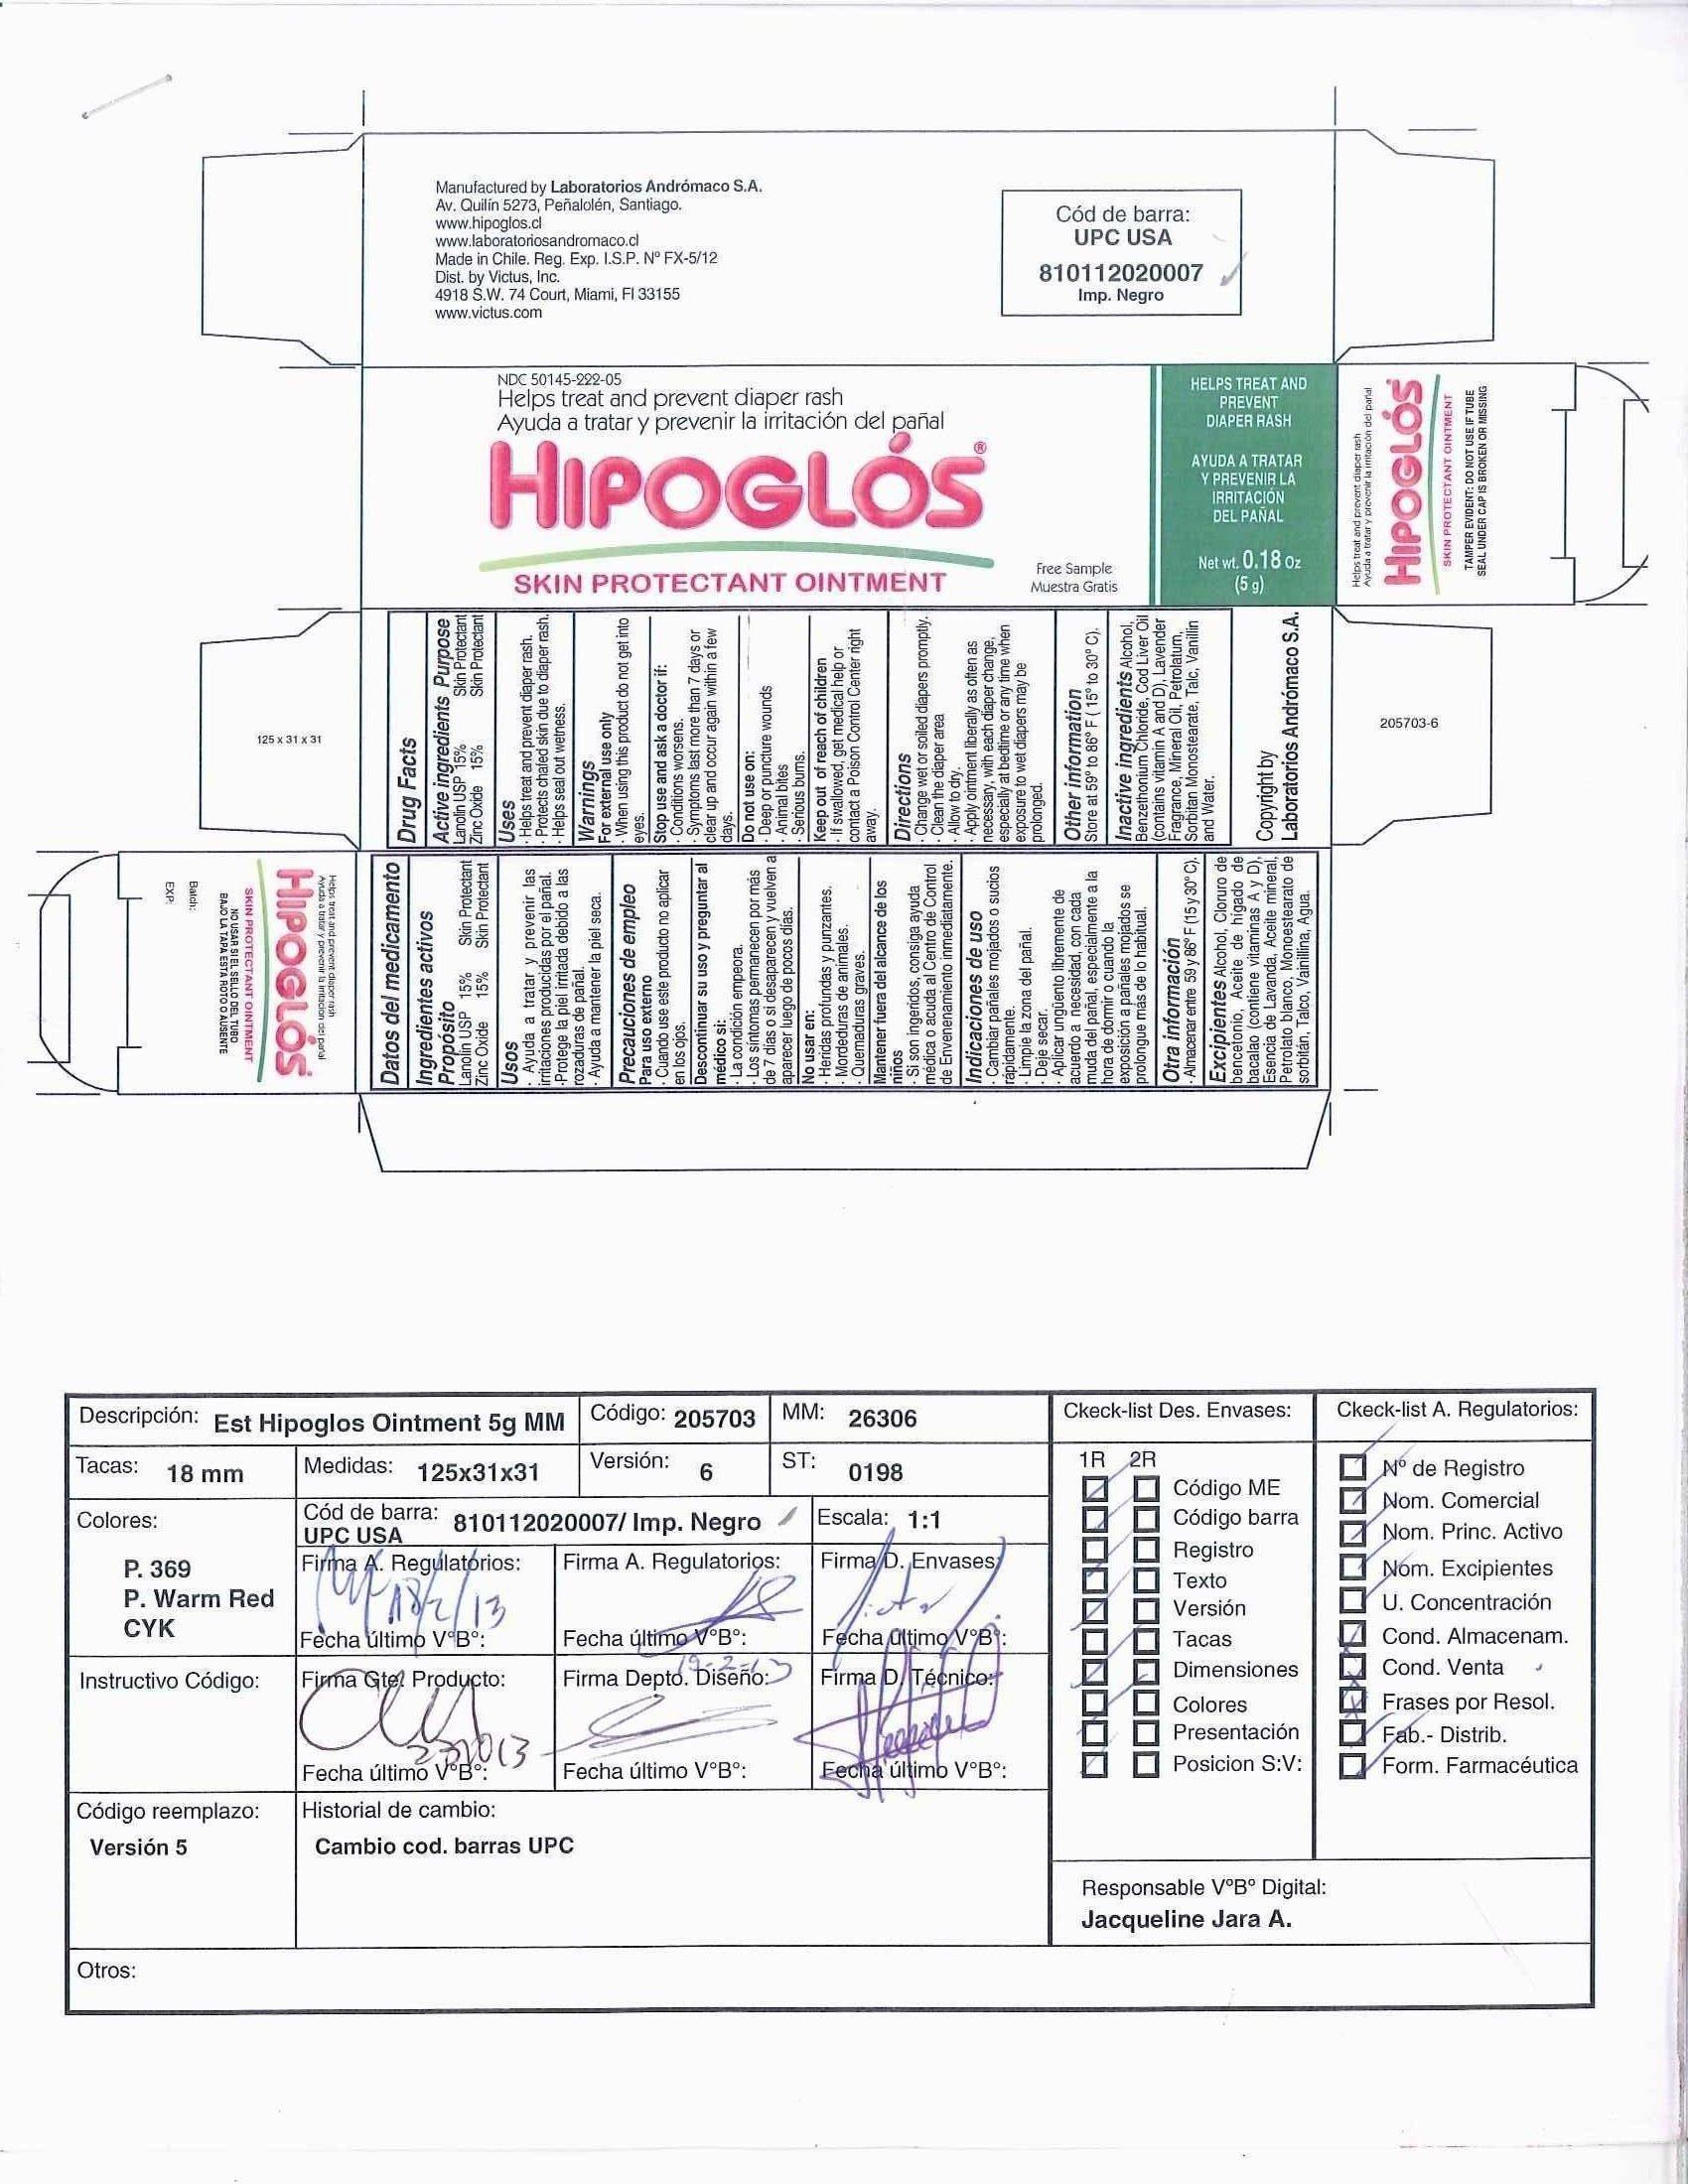 Hipoglos Ointment Laboratorios Andromaco S A